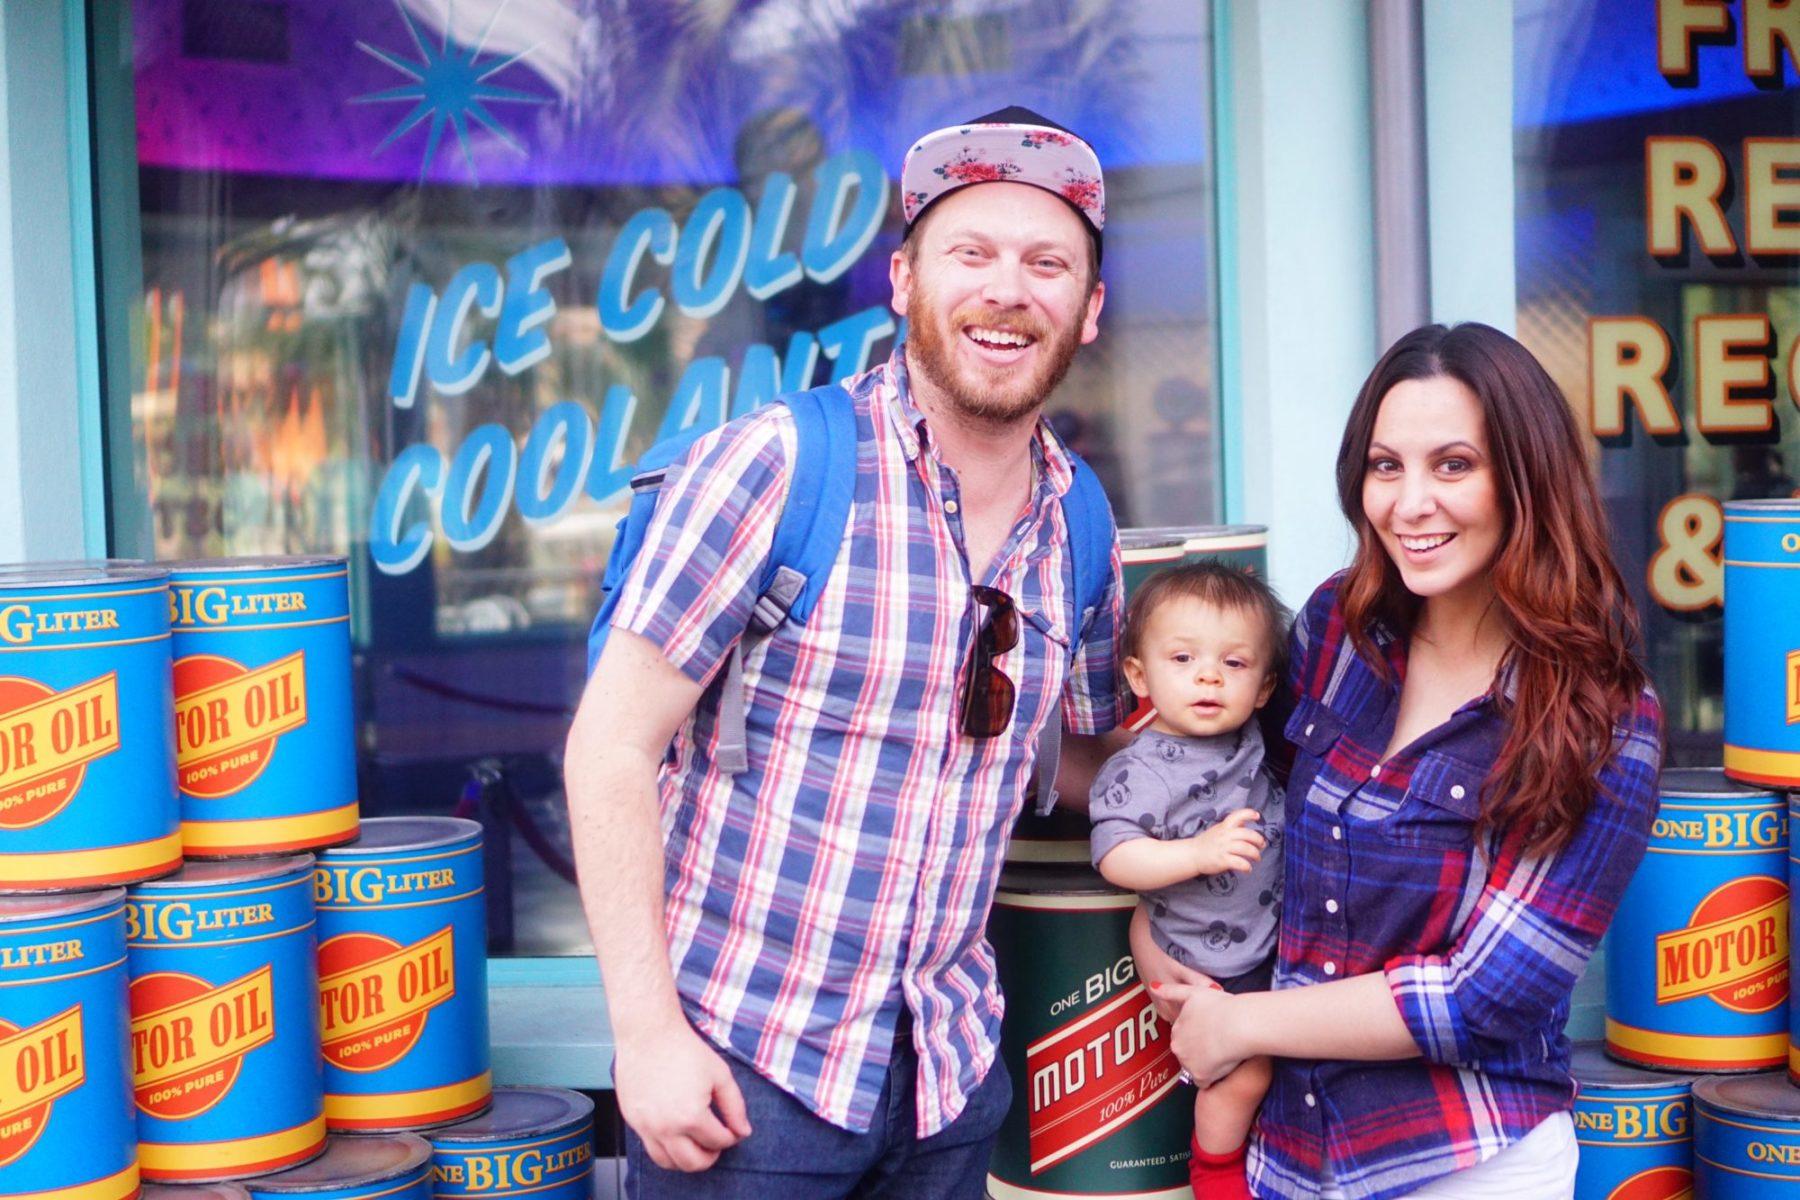 Disneyland - TheFebruaryFox.com